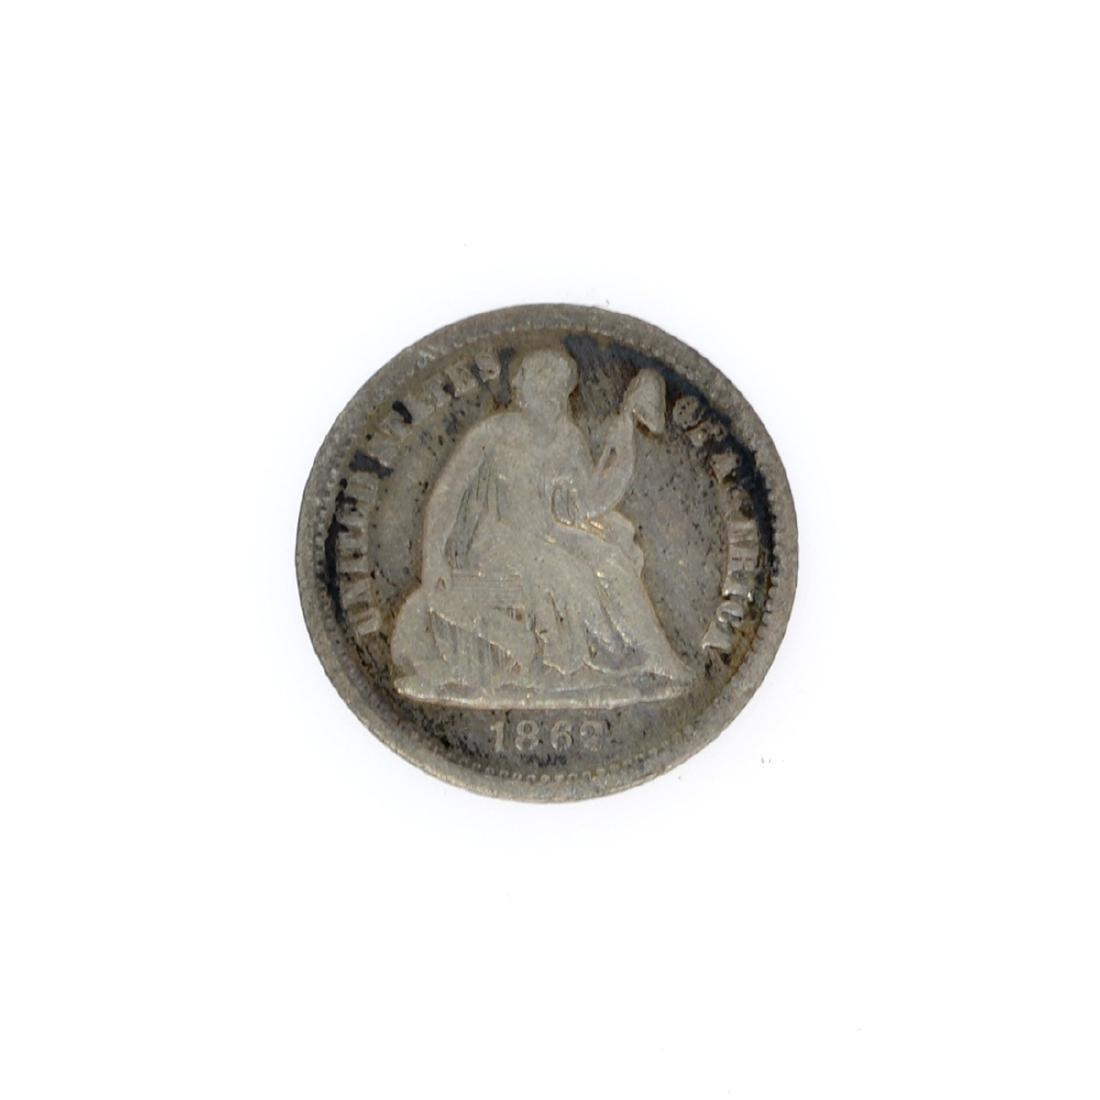 Rare 1862 Liberty Seated Half Dime Coin